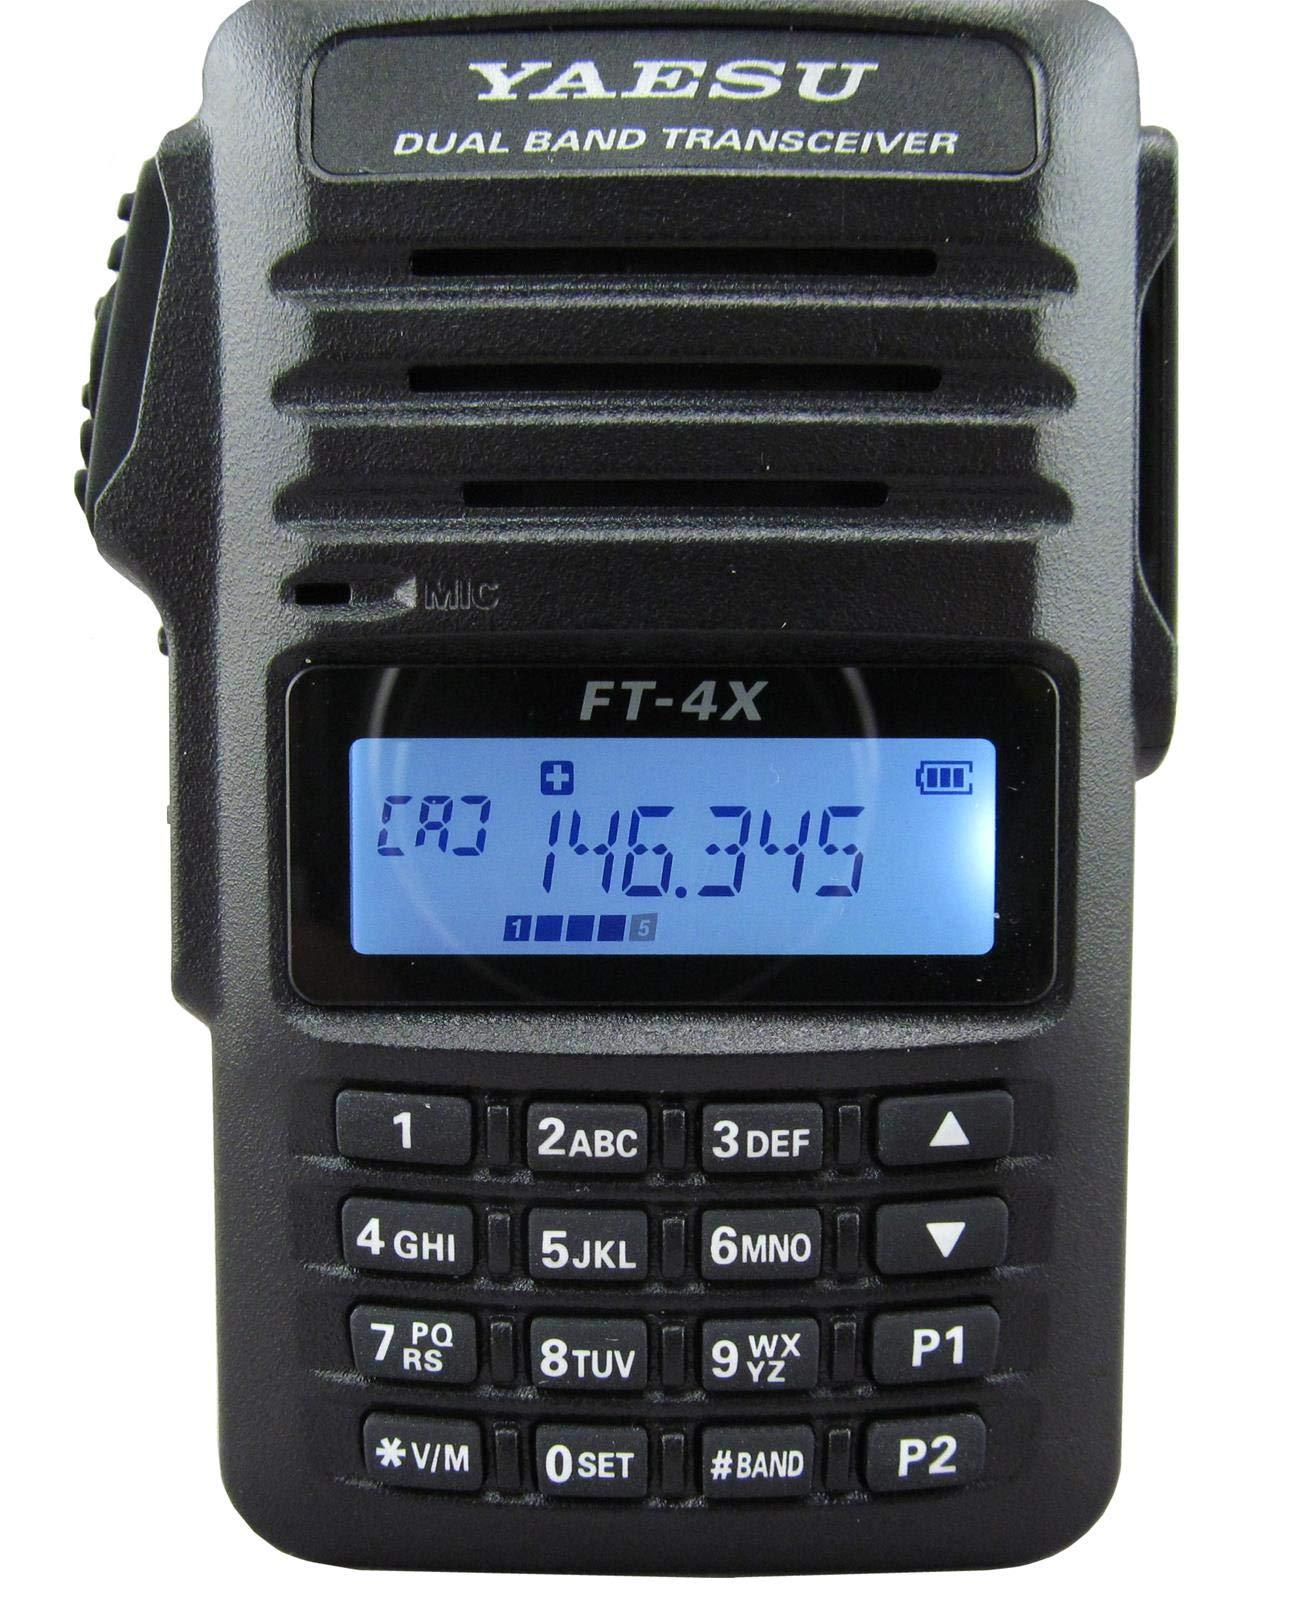 Yaesu Original FT-4V FT-4VR 144 MHz VHF Mono Band FM Hanheld Transceiver by Yaesu